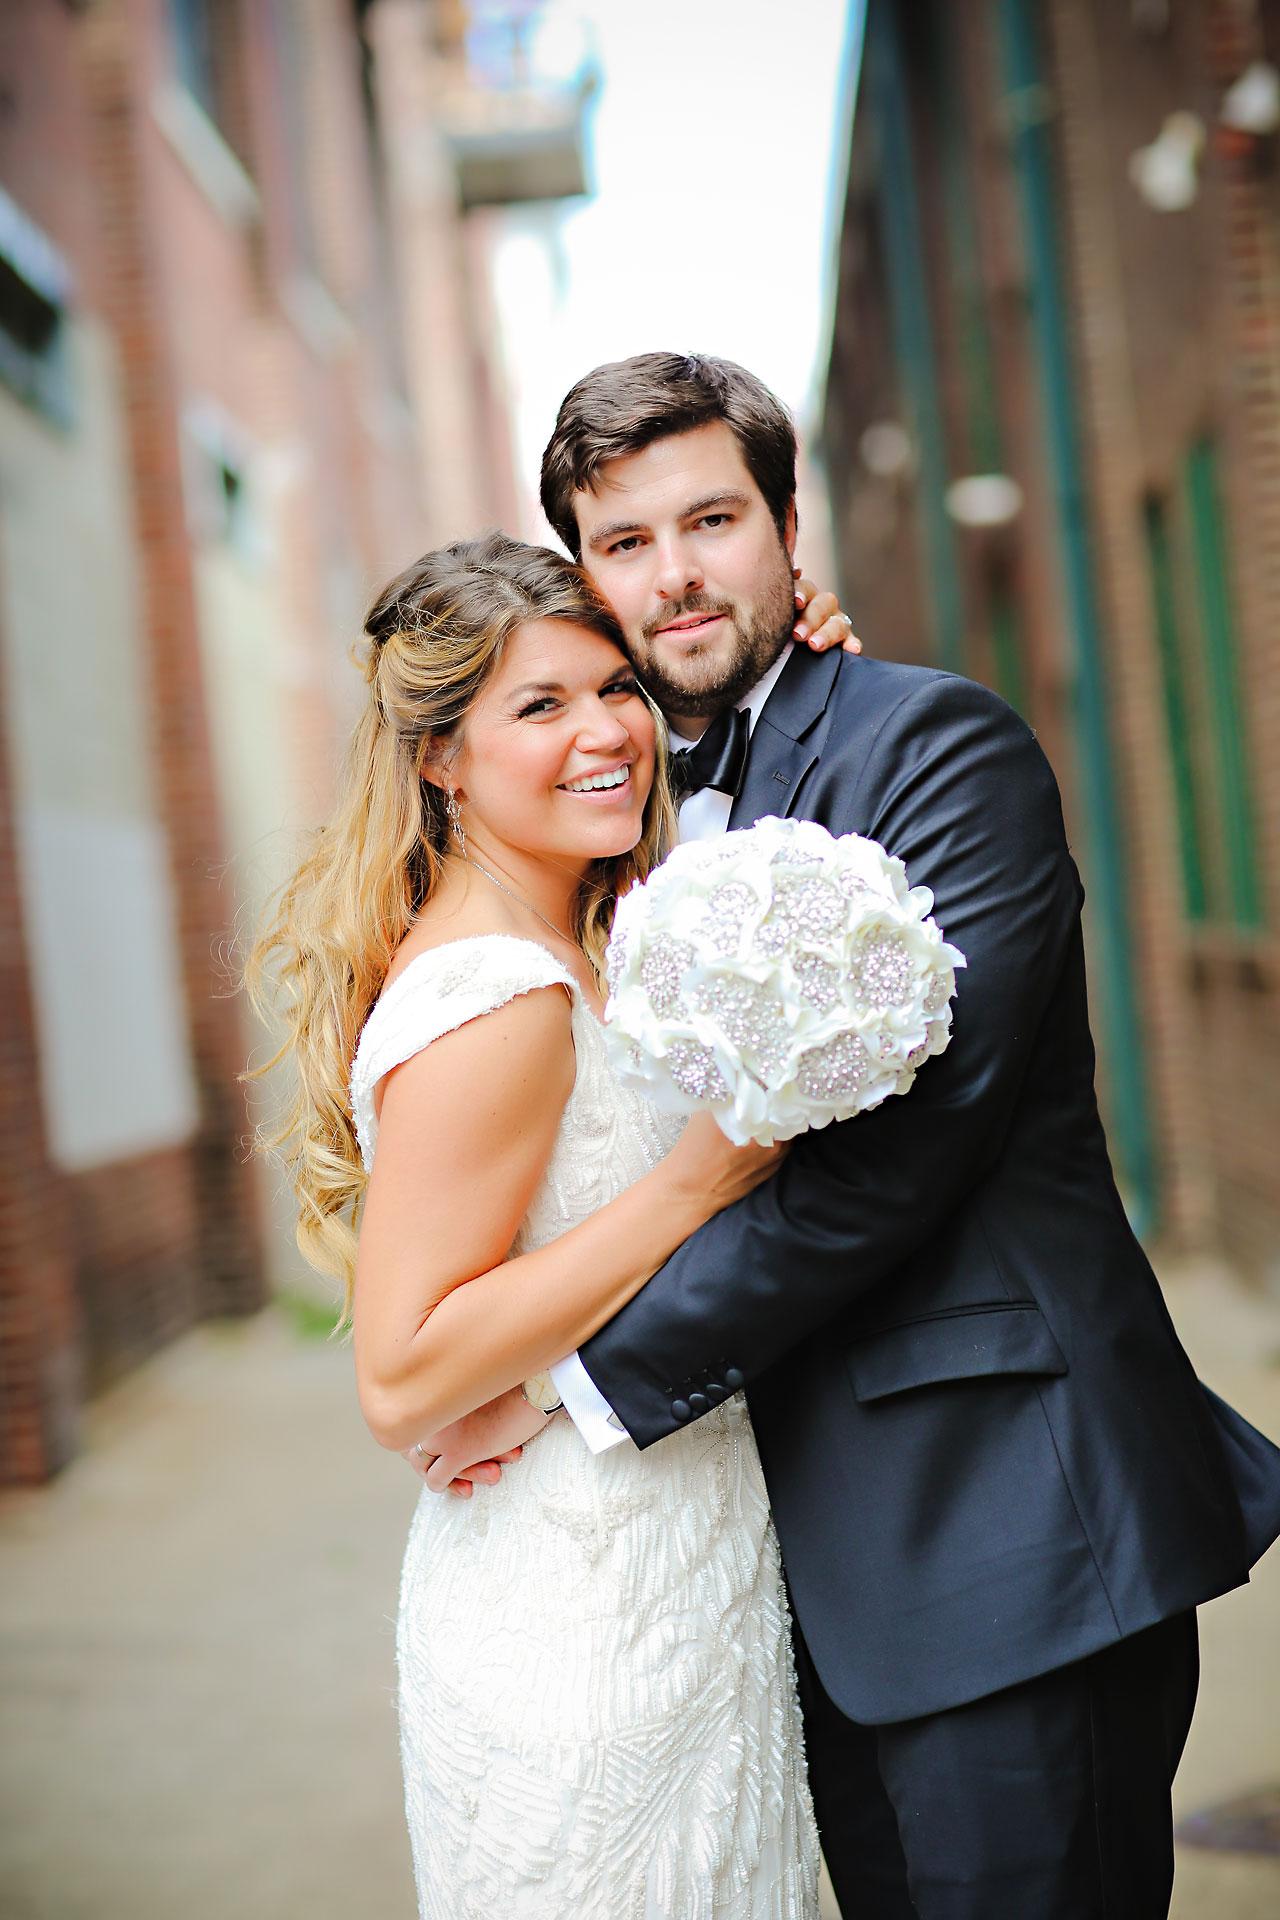 Amy Nick Canal 337 Wedding 149